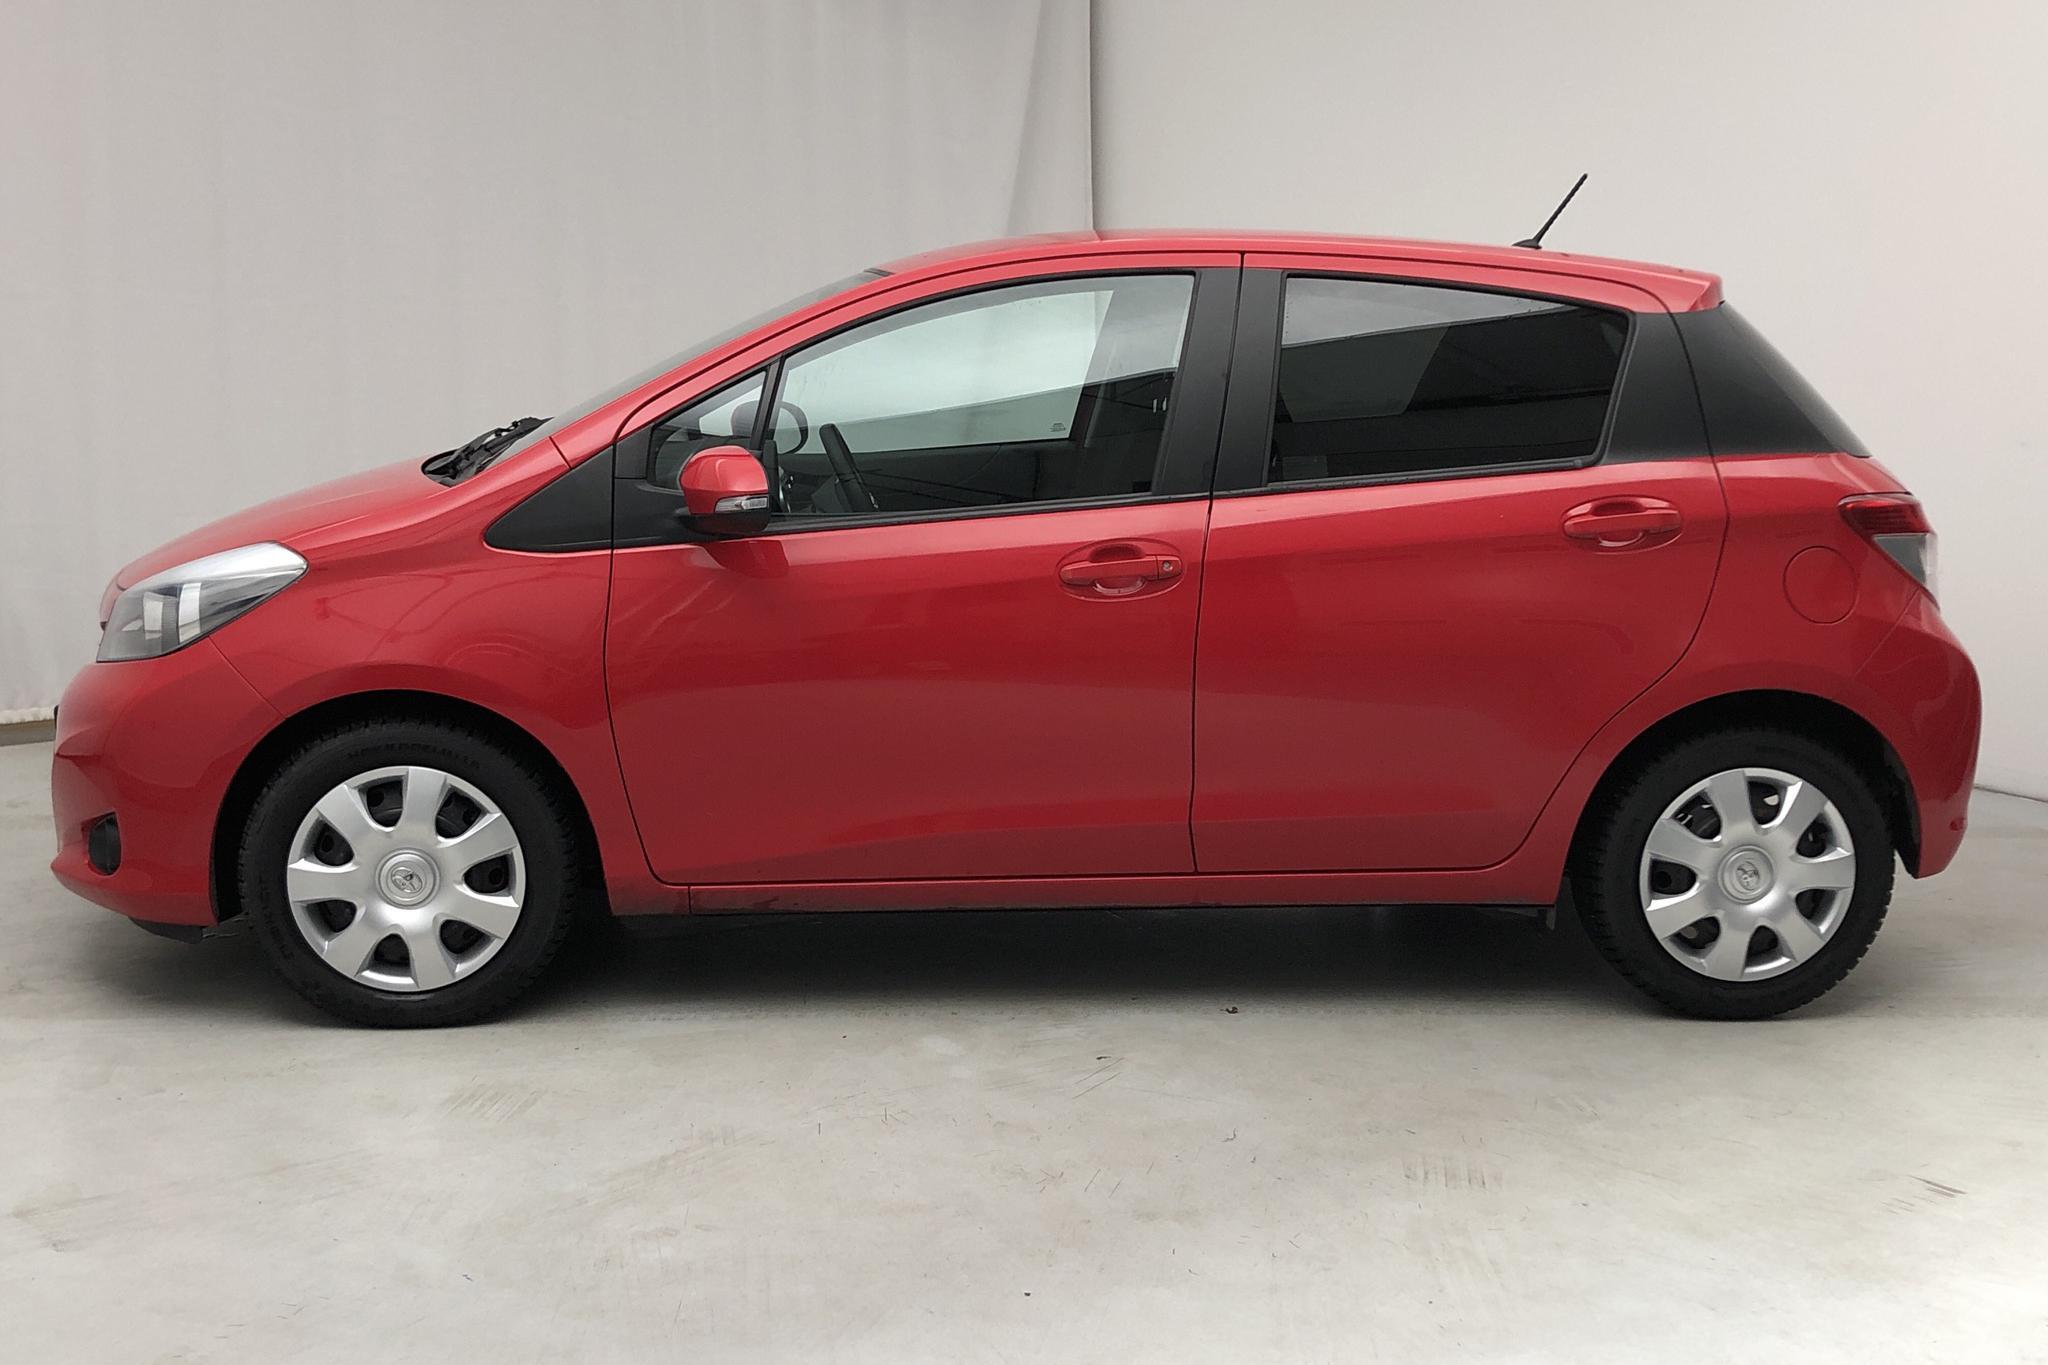 Toyota Yaris 1.33 5dr (100hk) - 8 743 mil - Manuell - röd - 2014